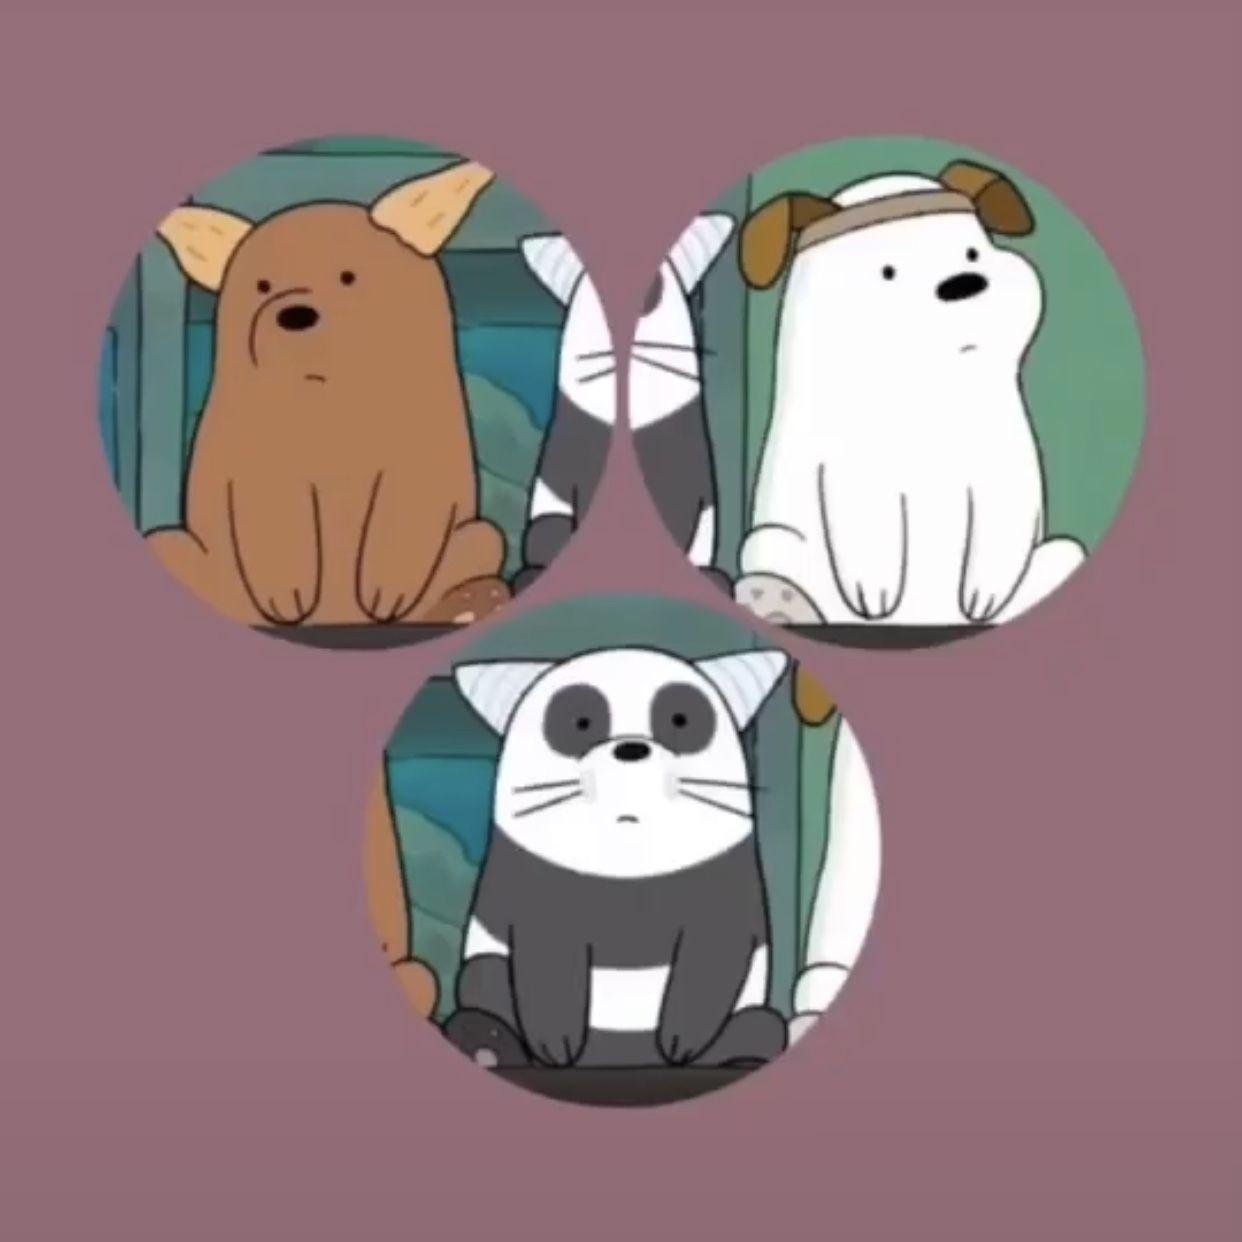 Metadinha De Trio Best Friends Cartoon Cute Cartoon Wallpapers Cute Profile Pictures